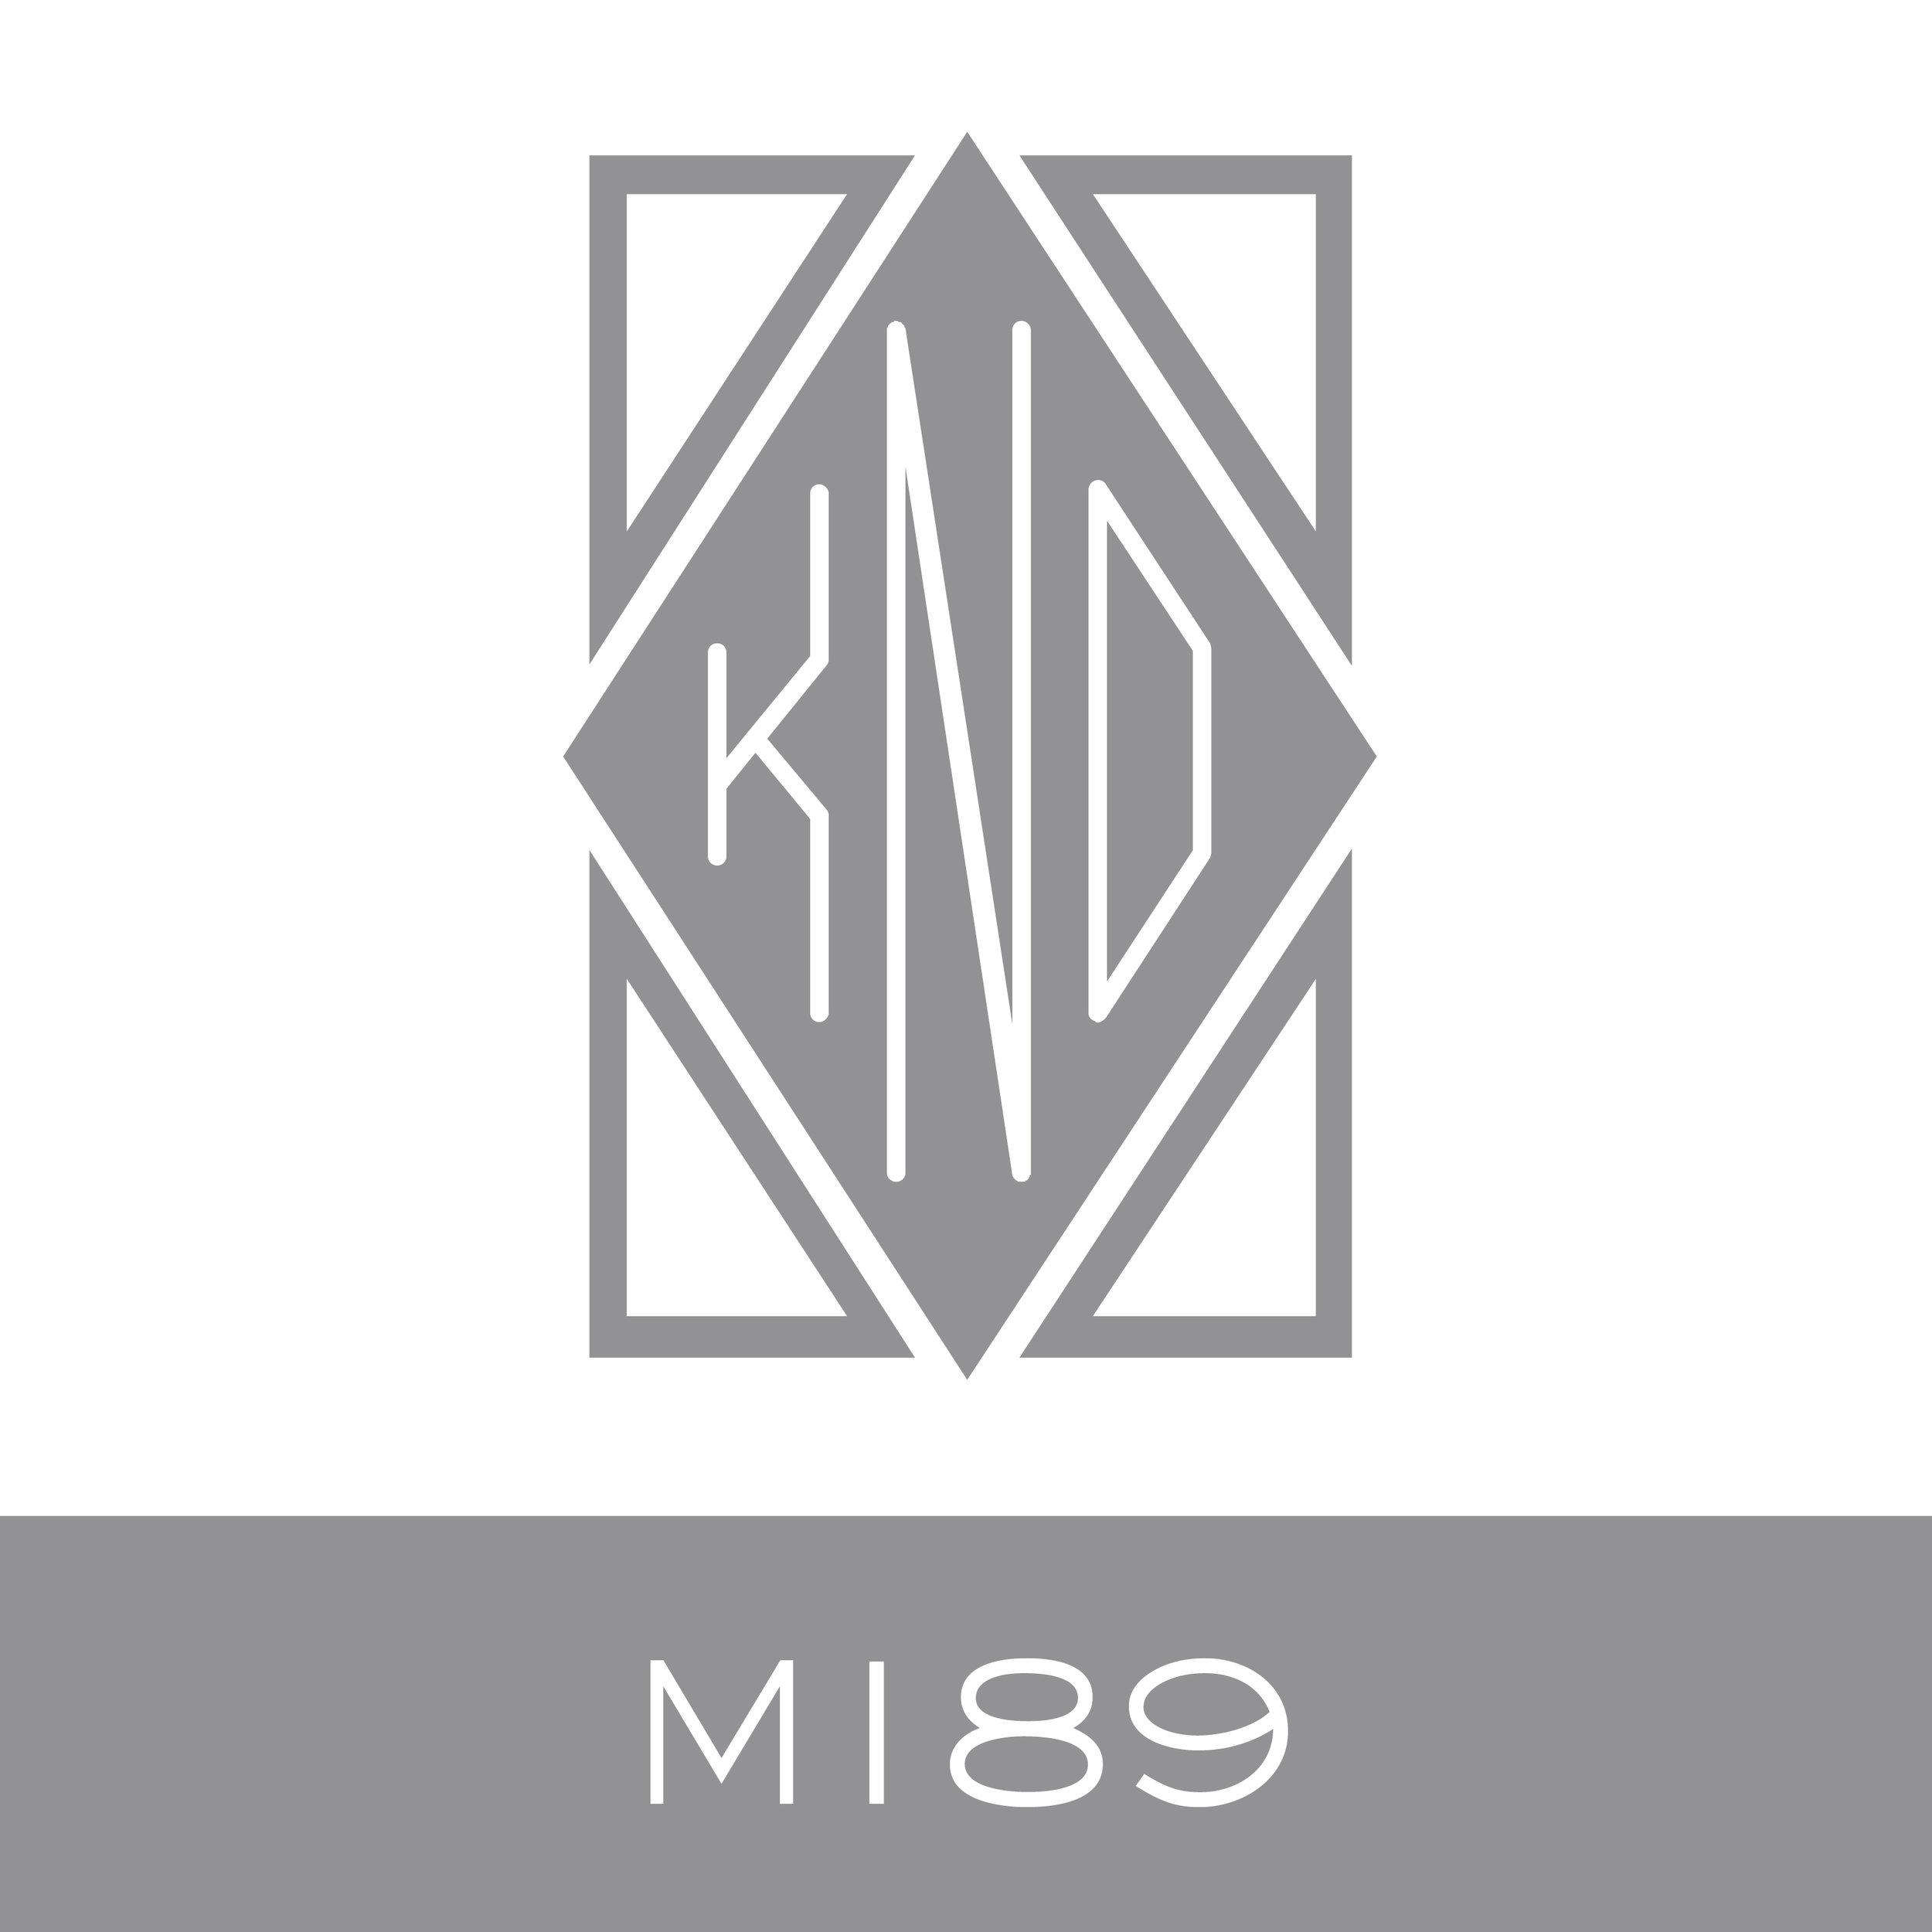 M189.jpg